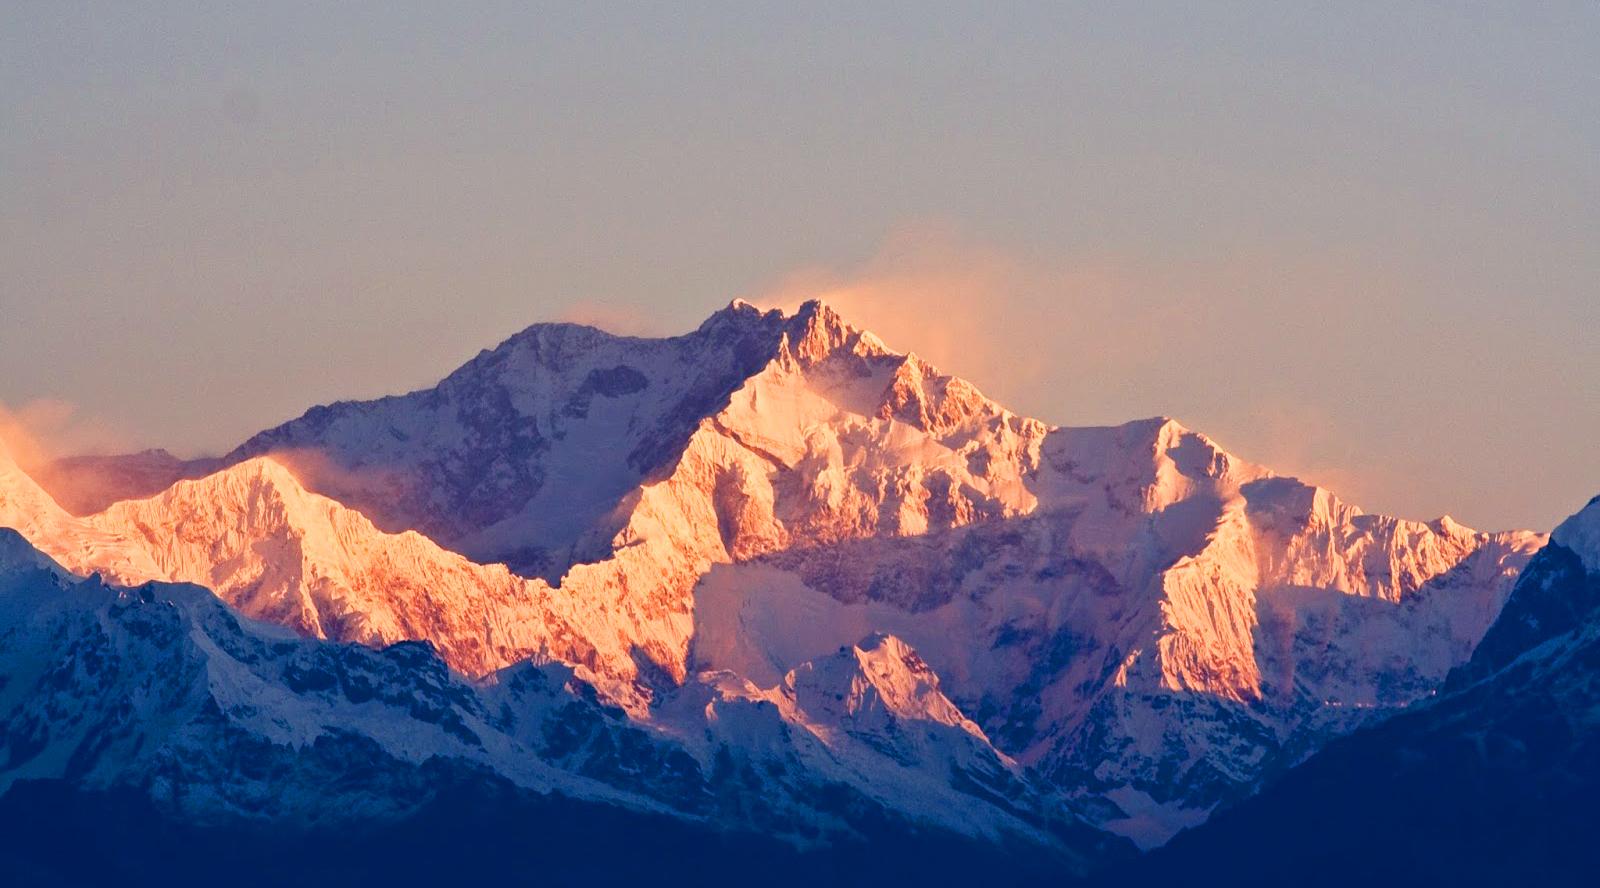 gunung tertinggi di dunia youtube gunung tertinggi di dunia youtube com gunung tertinggi didunia dan diindonesia gunung tertinggi didunia dan indonesia gunung tertinggi didunia terdapat gunung tertinggi didunia terletak dibenua